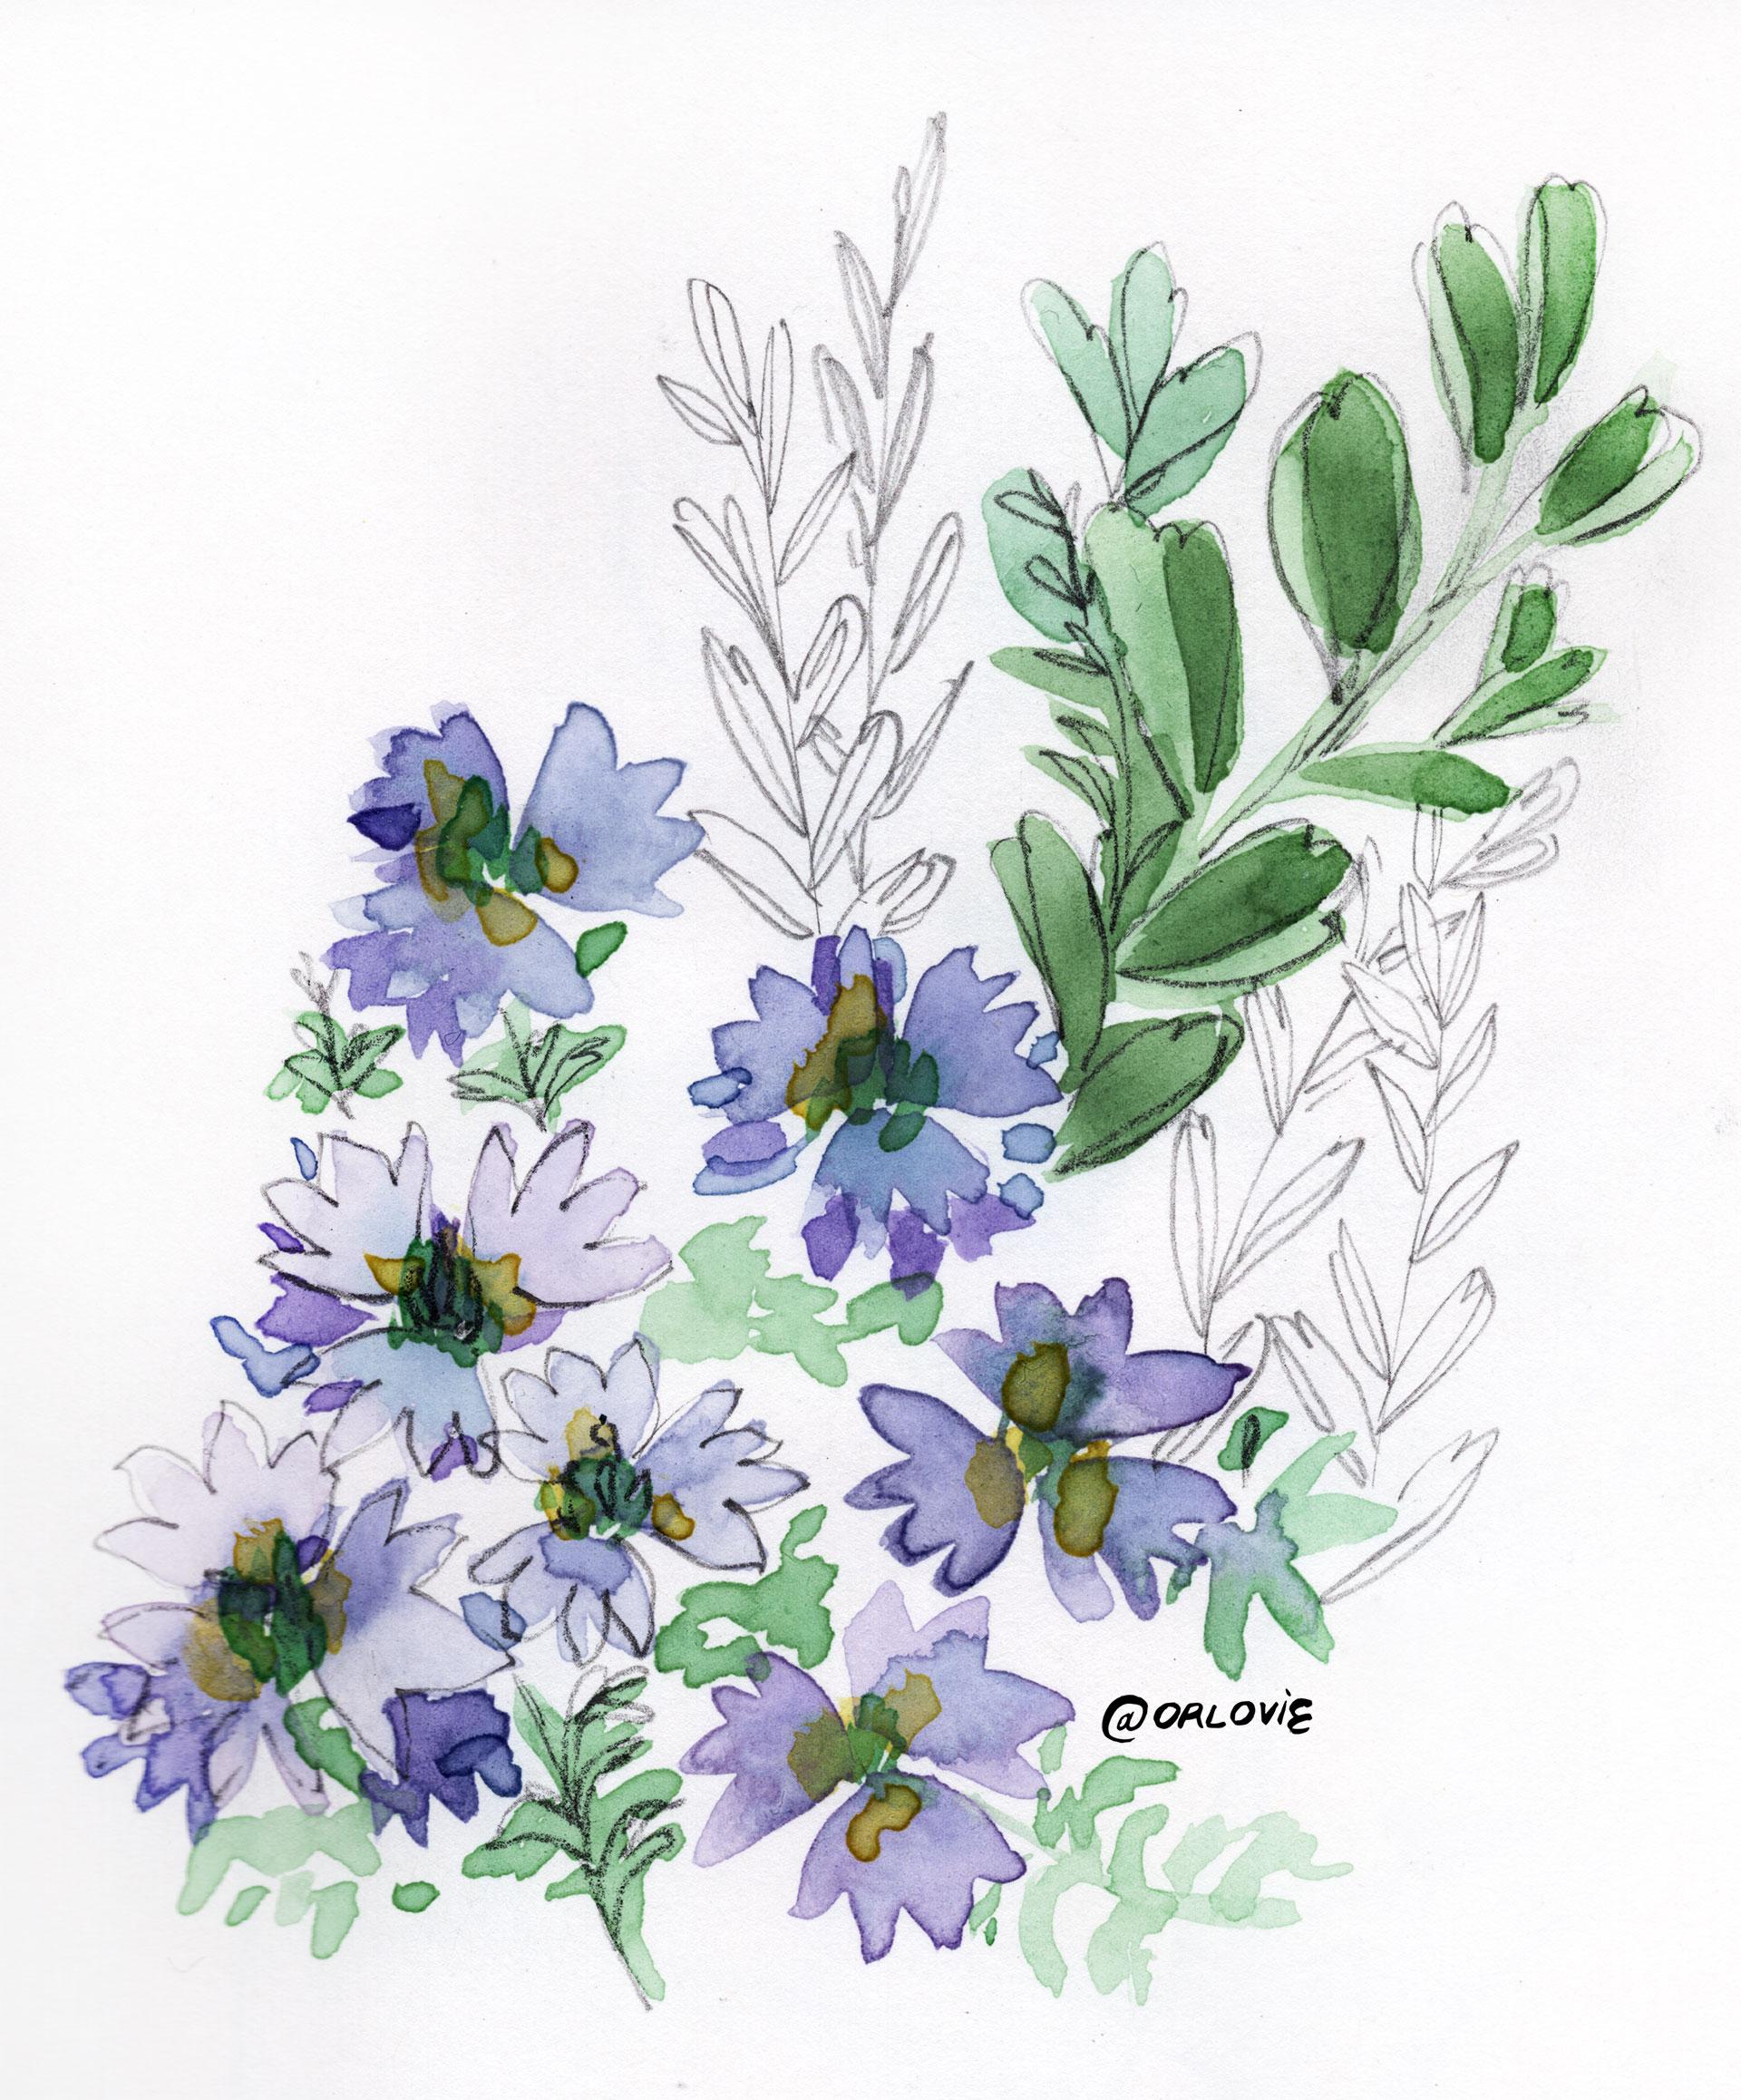 1920x2316 Drawing In The Fairy Garden C'Est La Vie Orlovie